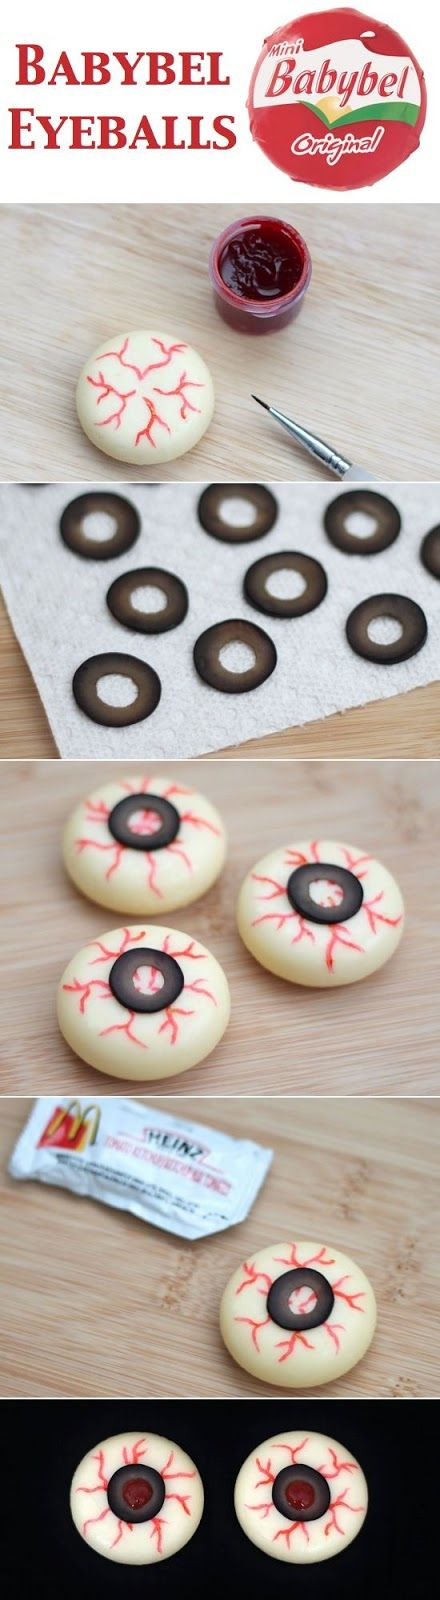 ojos sangrantes con quesitos Halloween                                                                                                                                                                                 Más